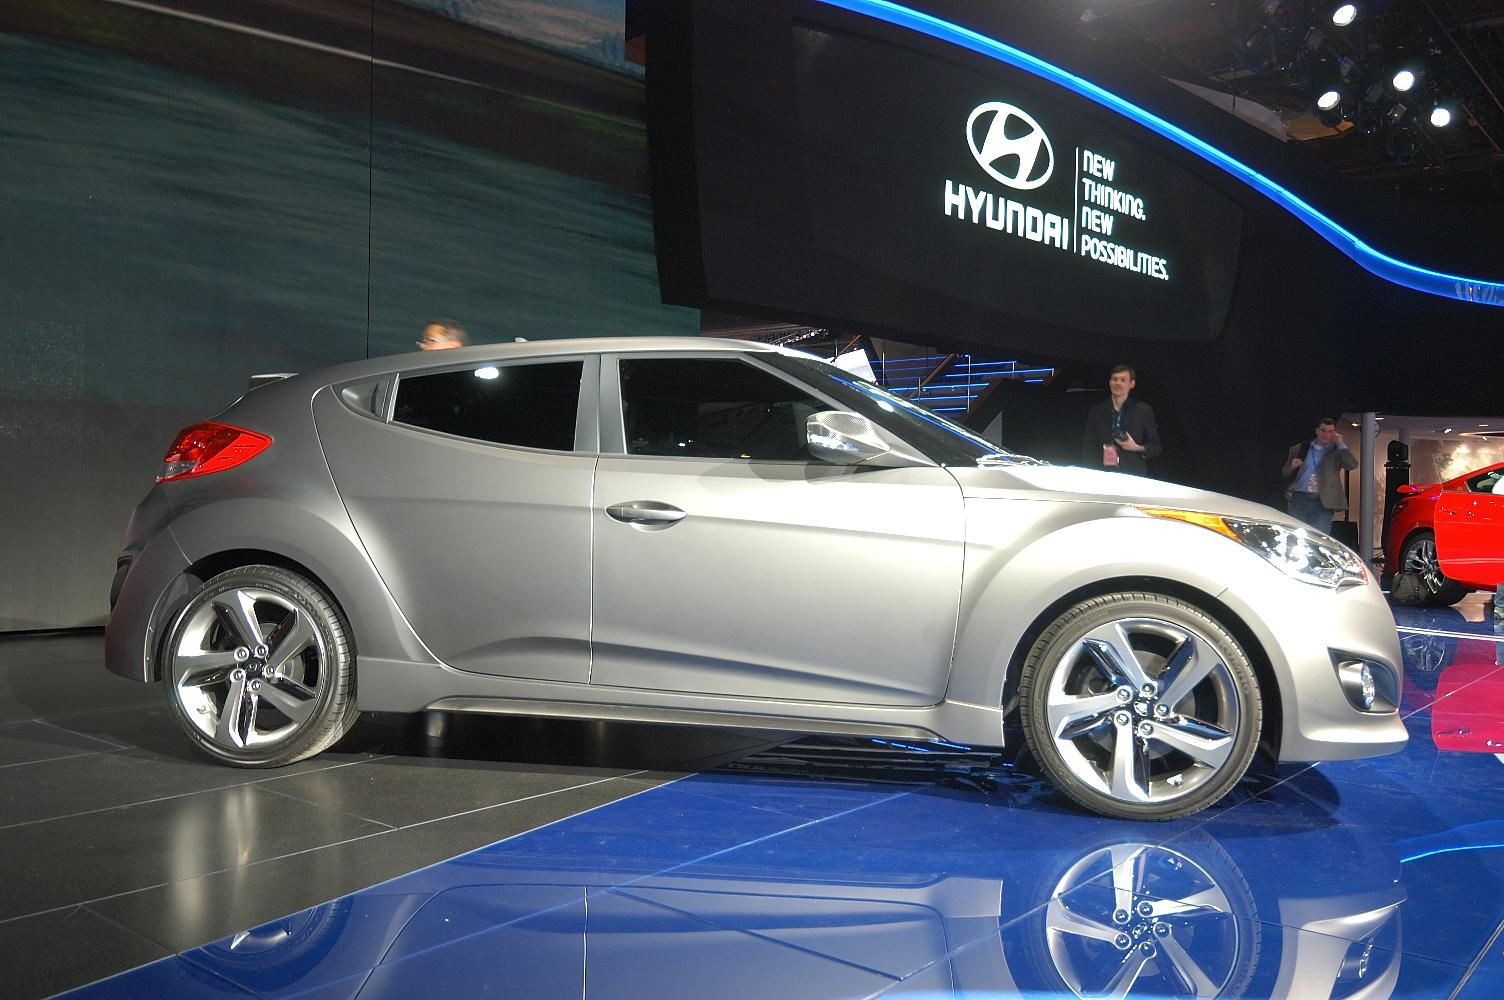 Hyundai Veloster NAIAS 2012 3